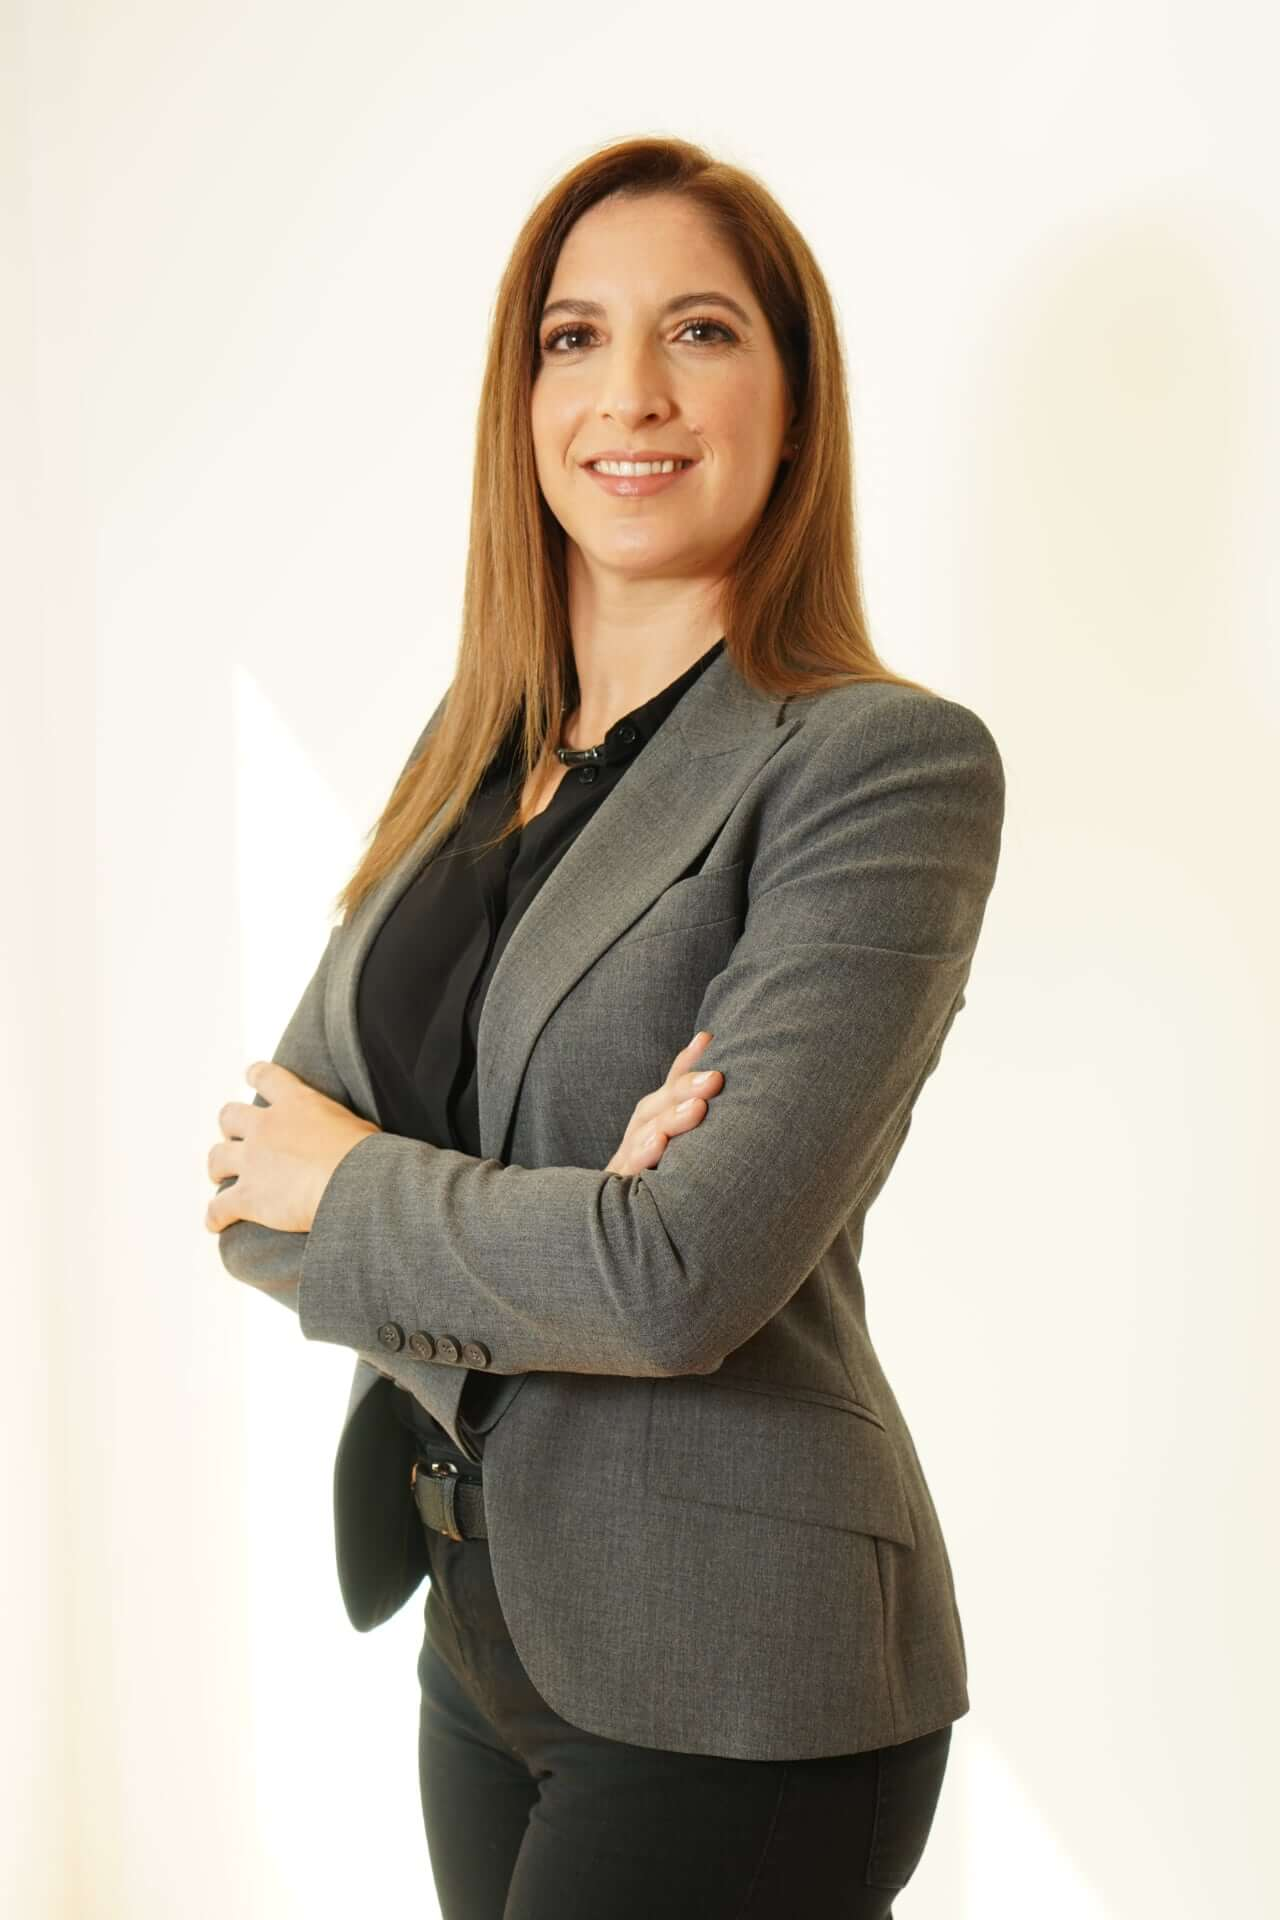 Laura Alho